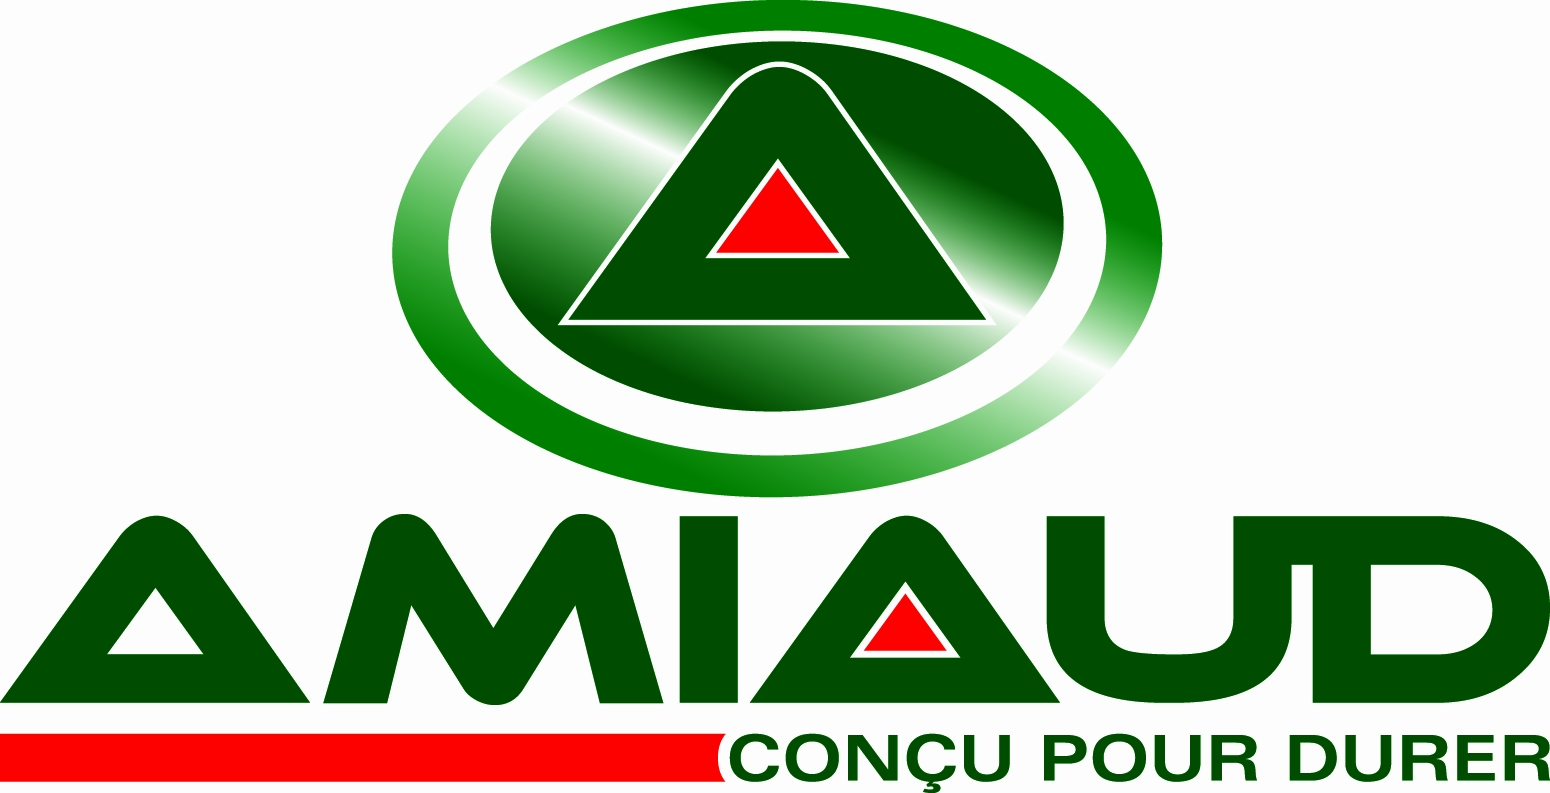 AMIAUD logo